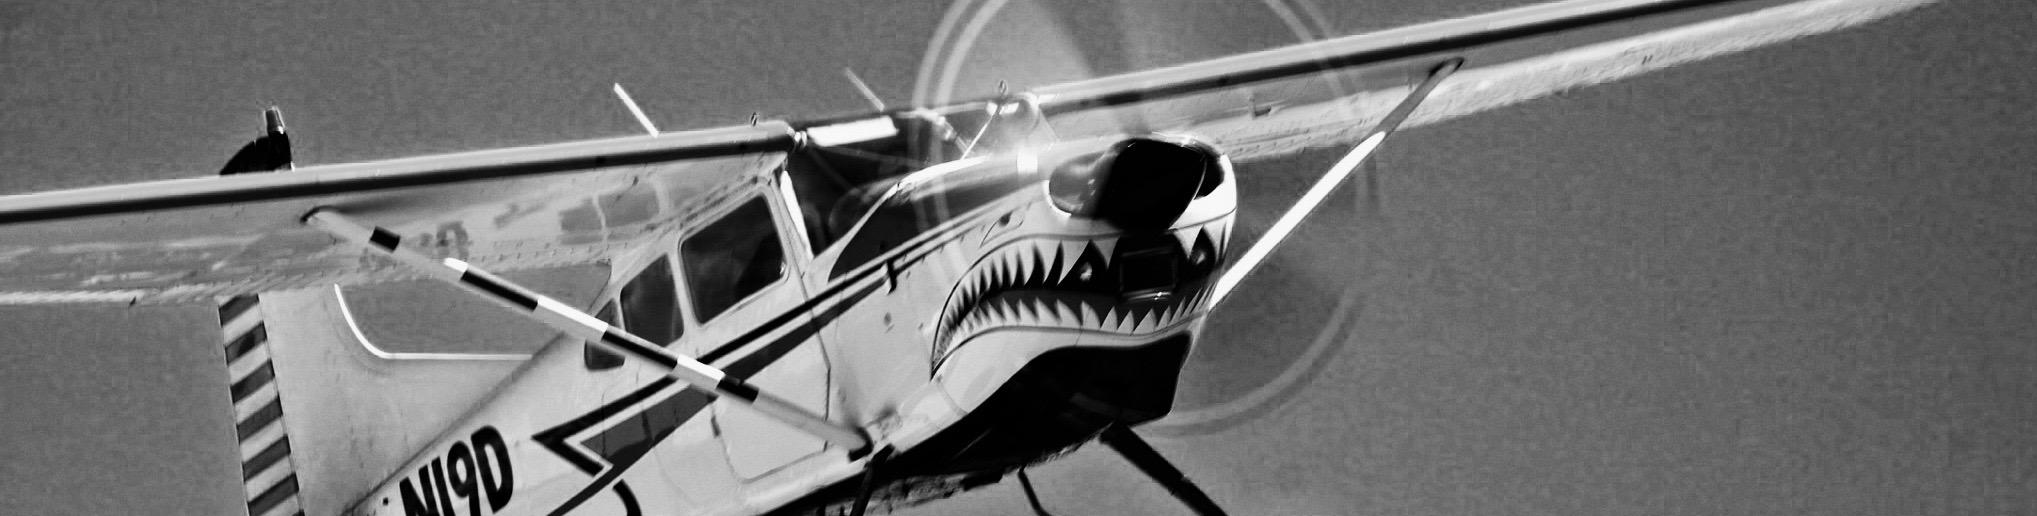 Shark Aviation Seaplane